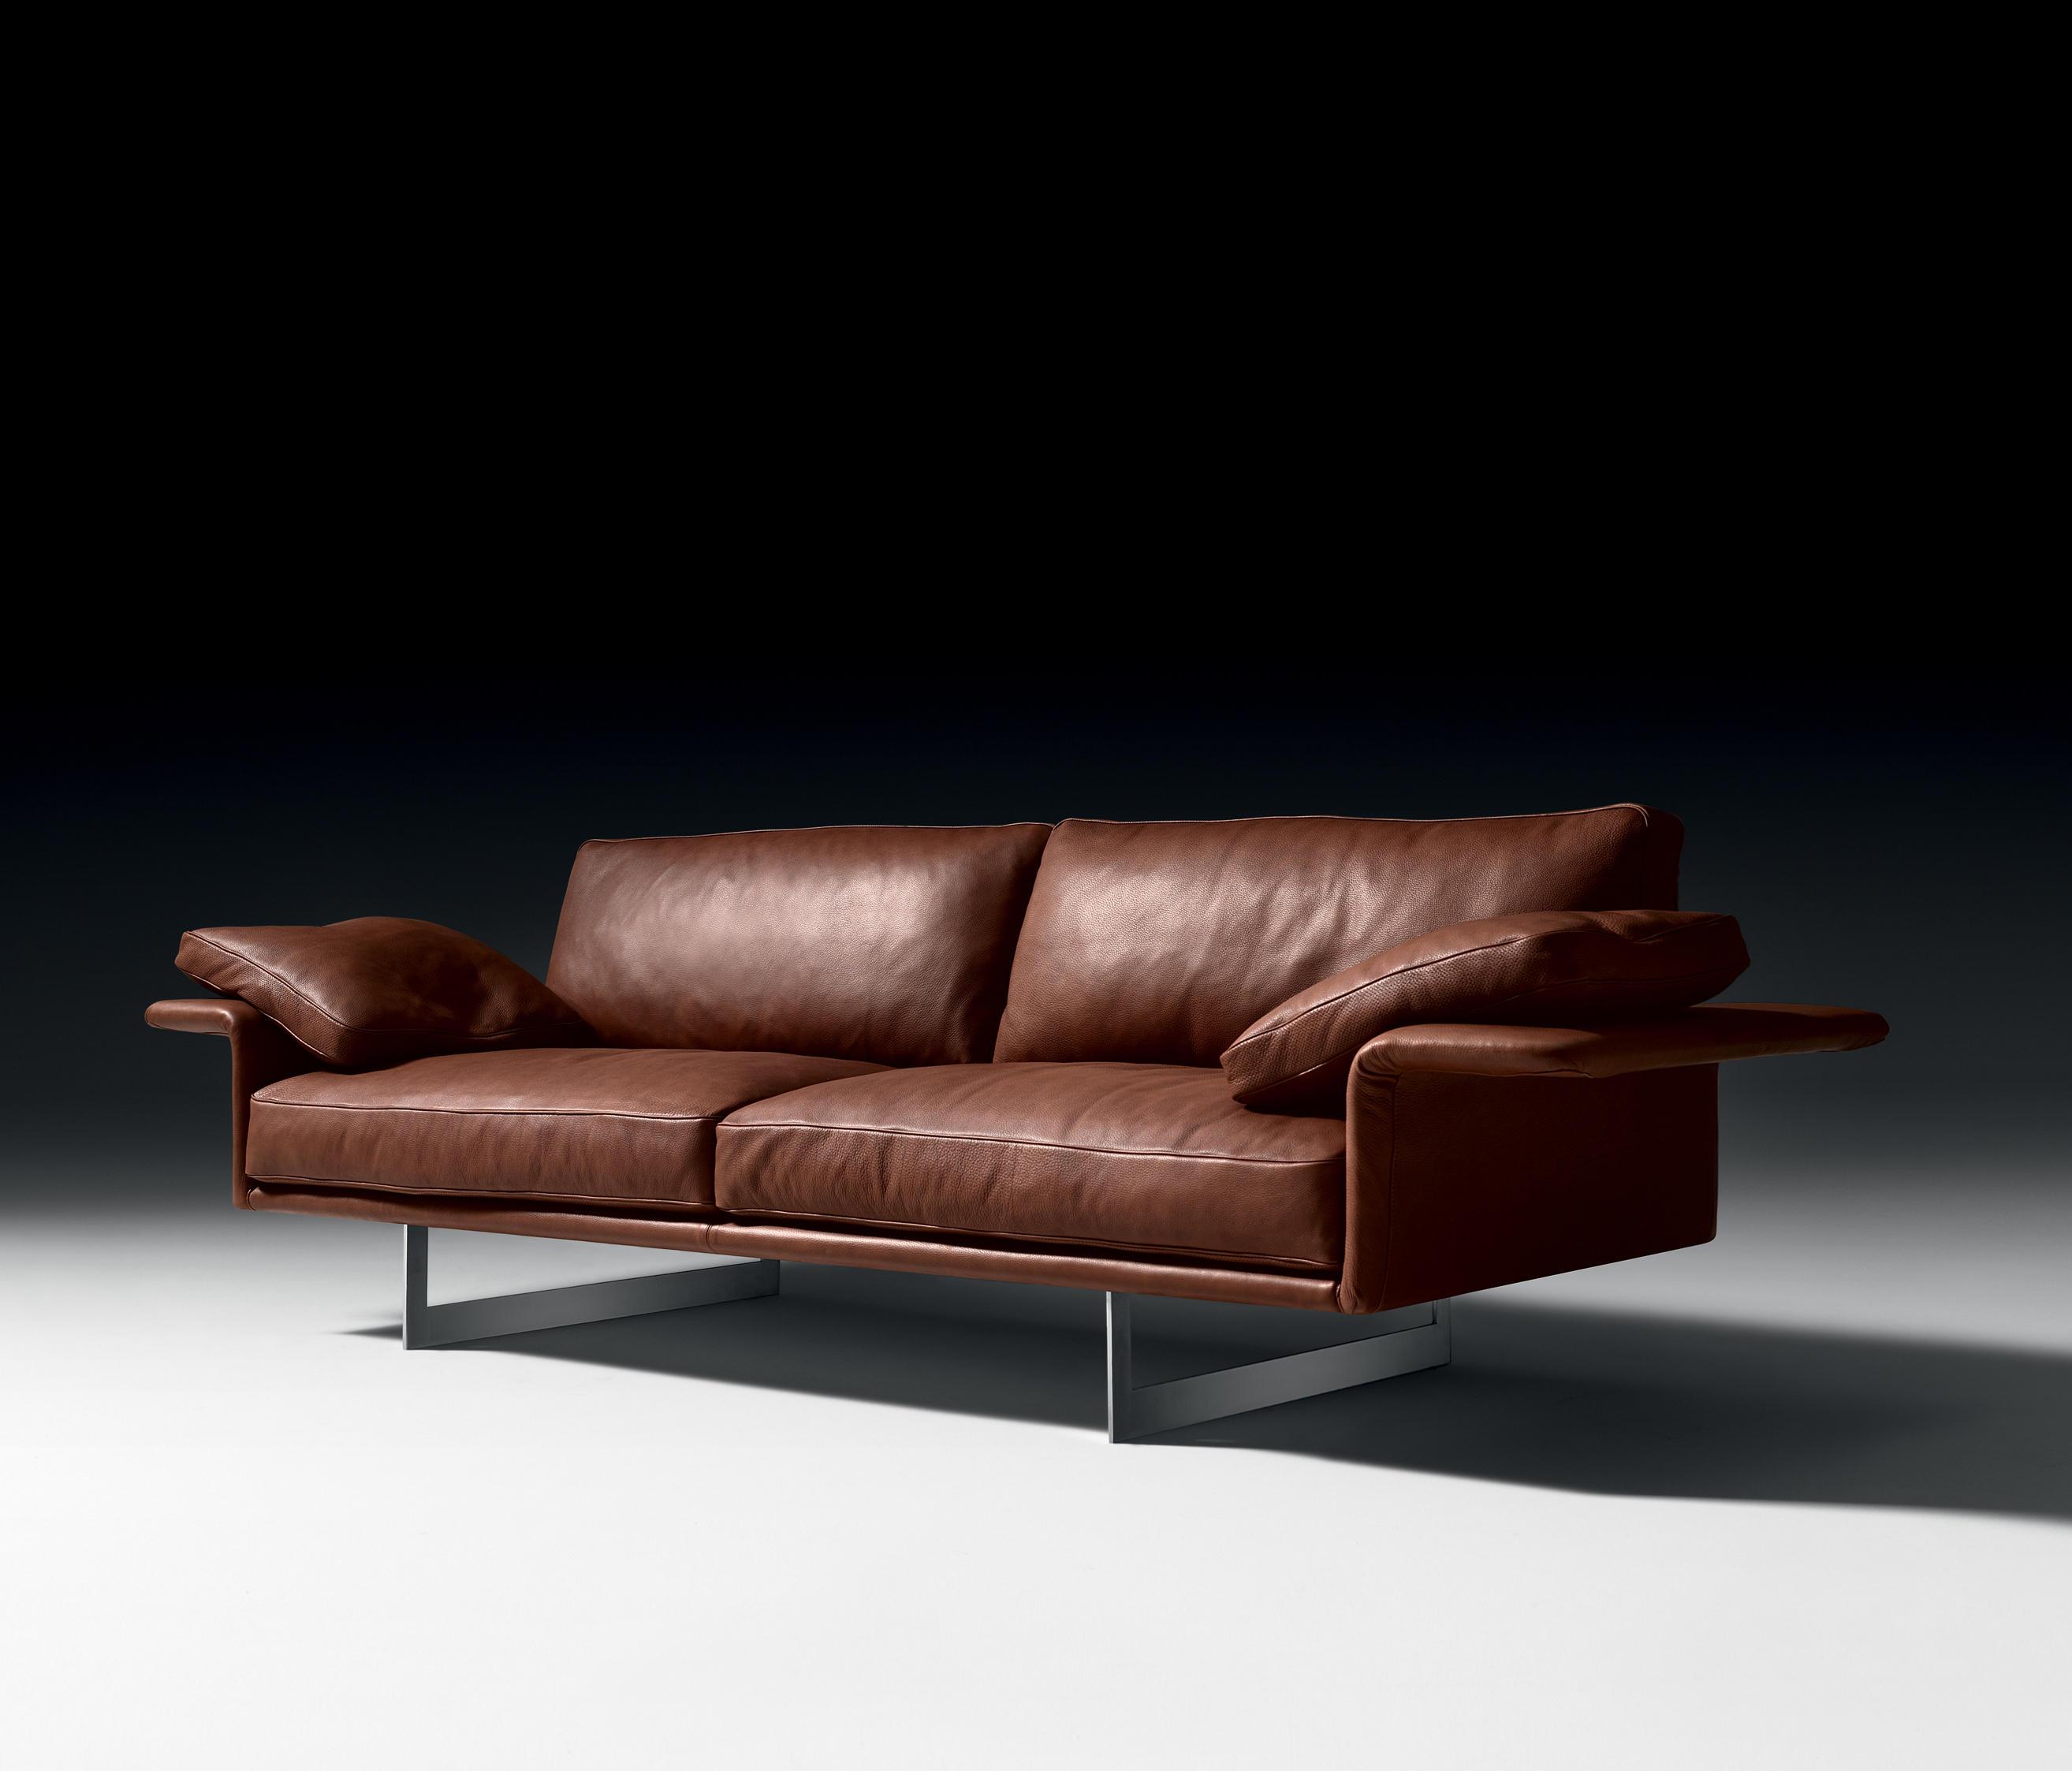 alato sofa sofas from black tie architonic. Black Bedroom Furniture Sets. Home Design Ideas